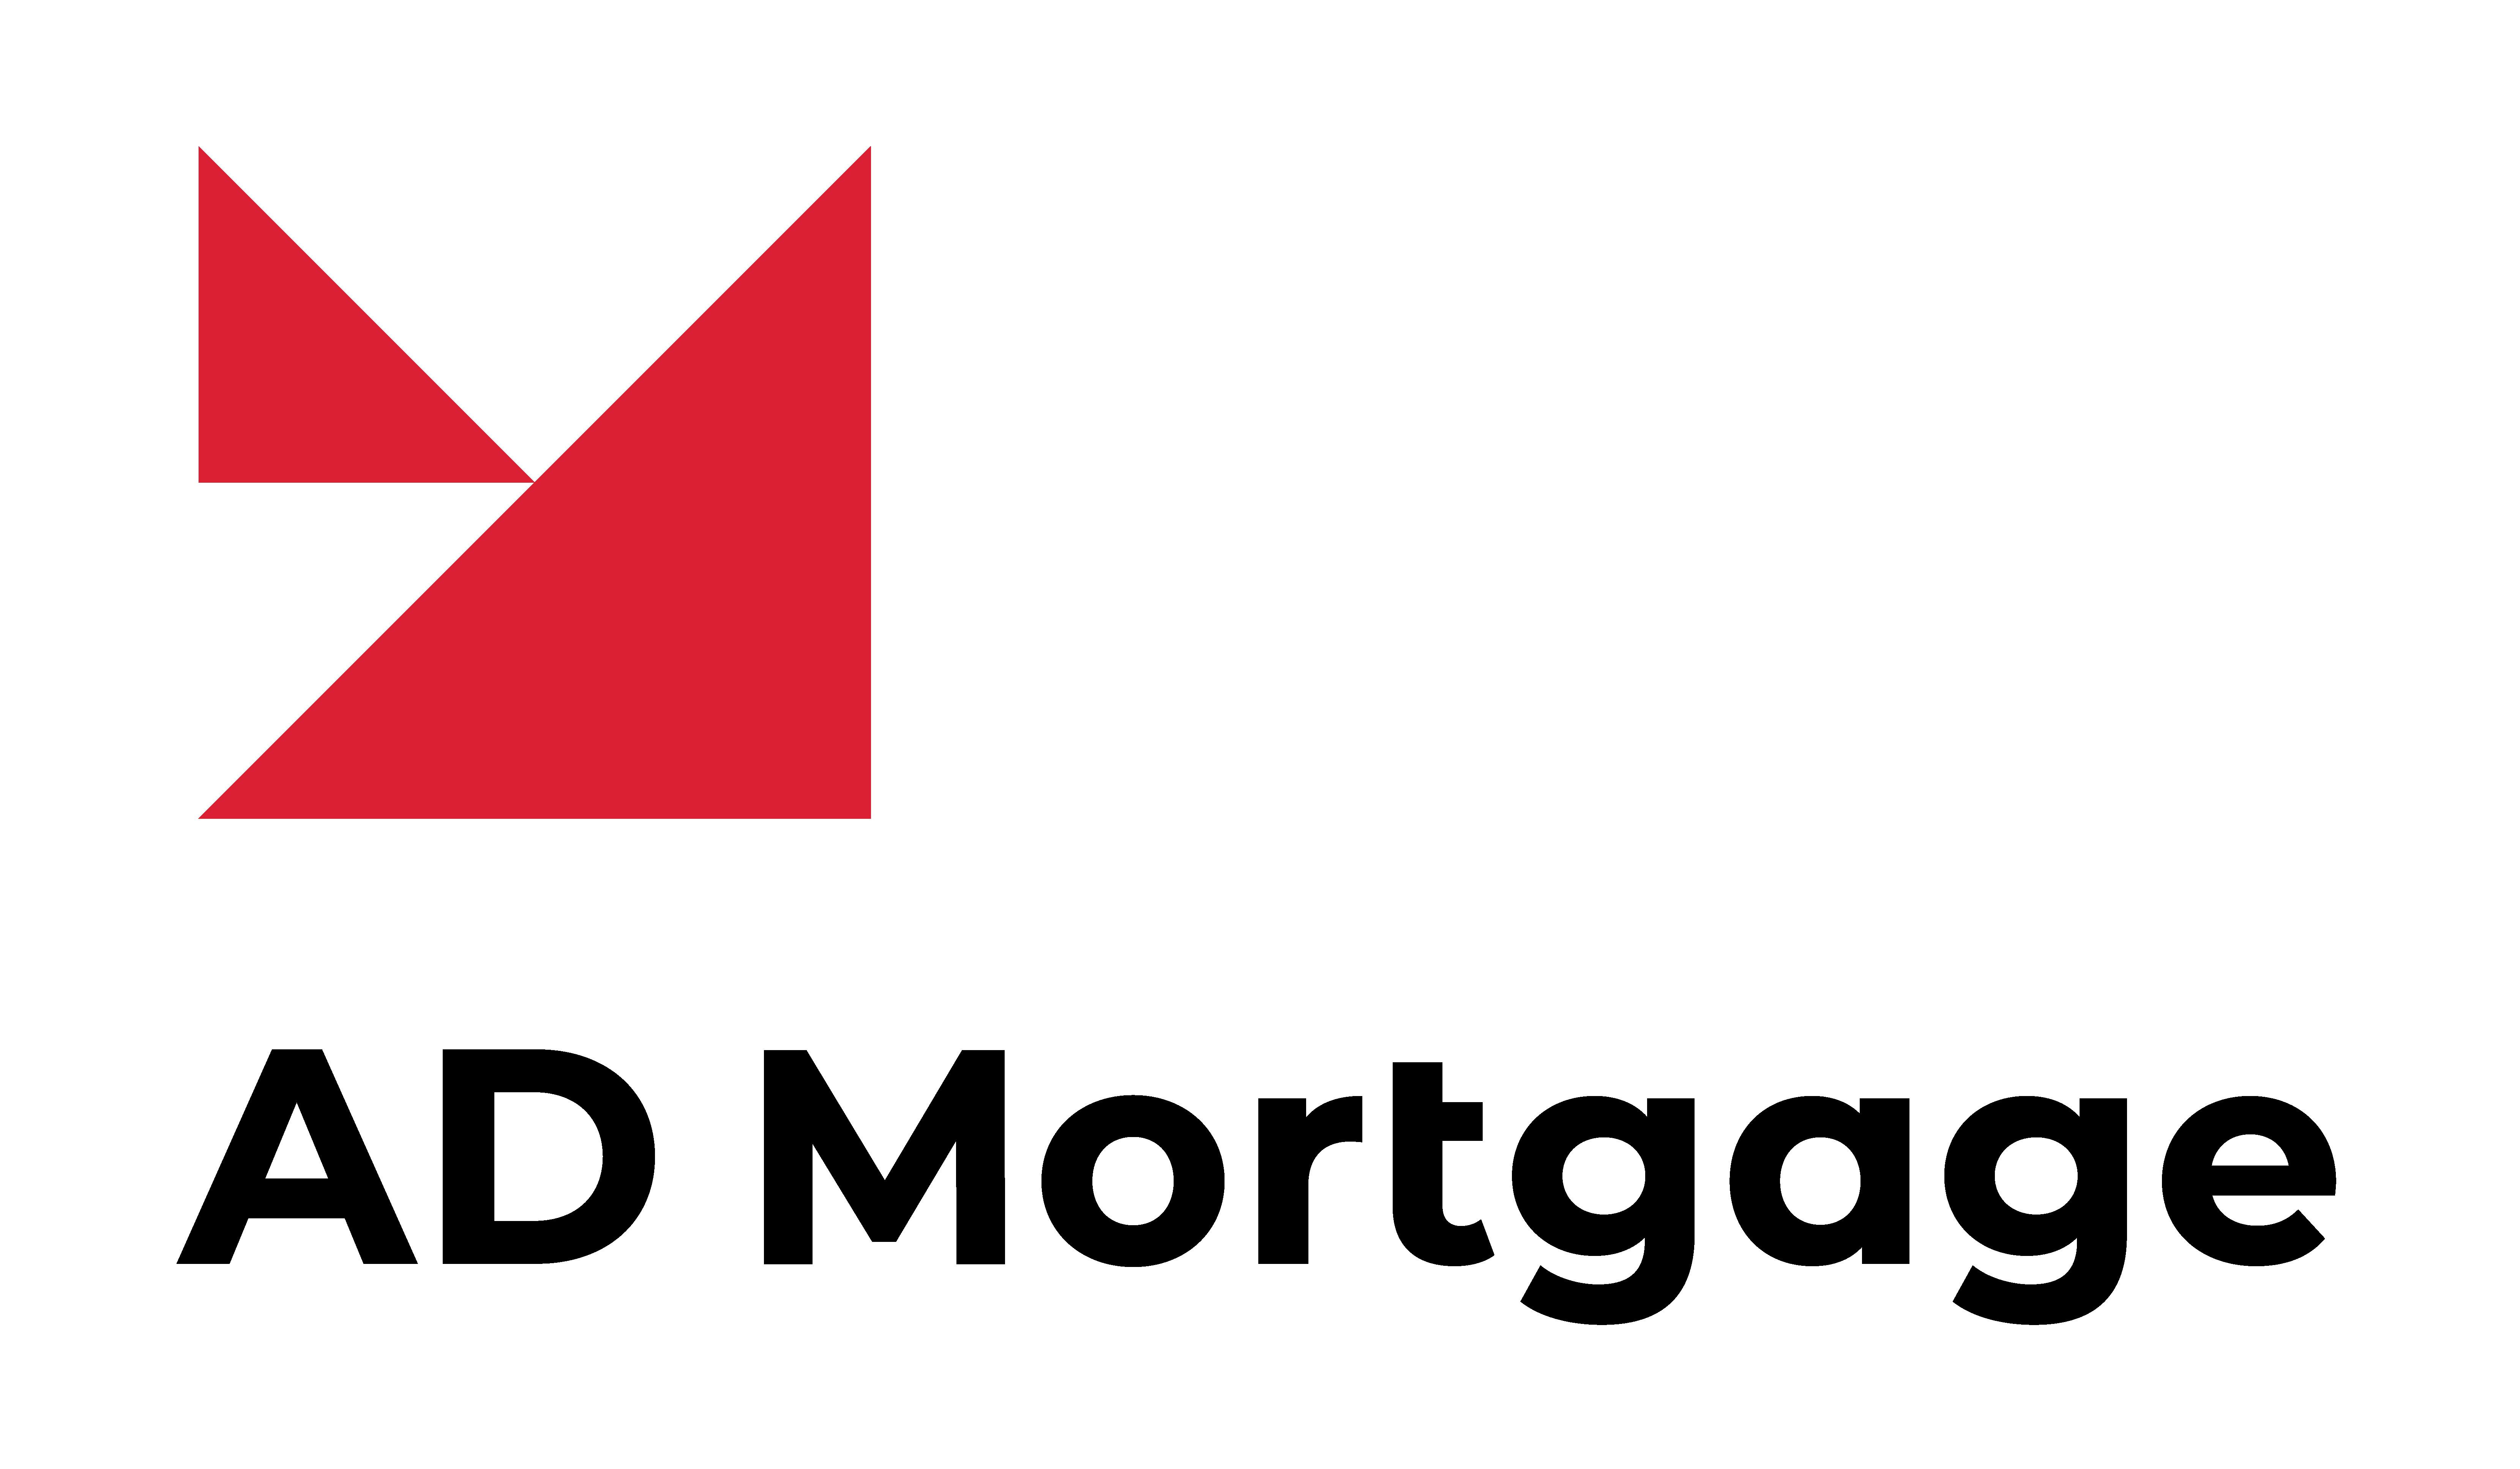 AD Mortgage